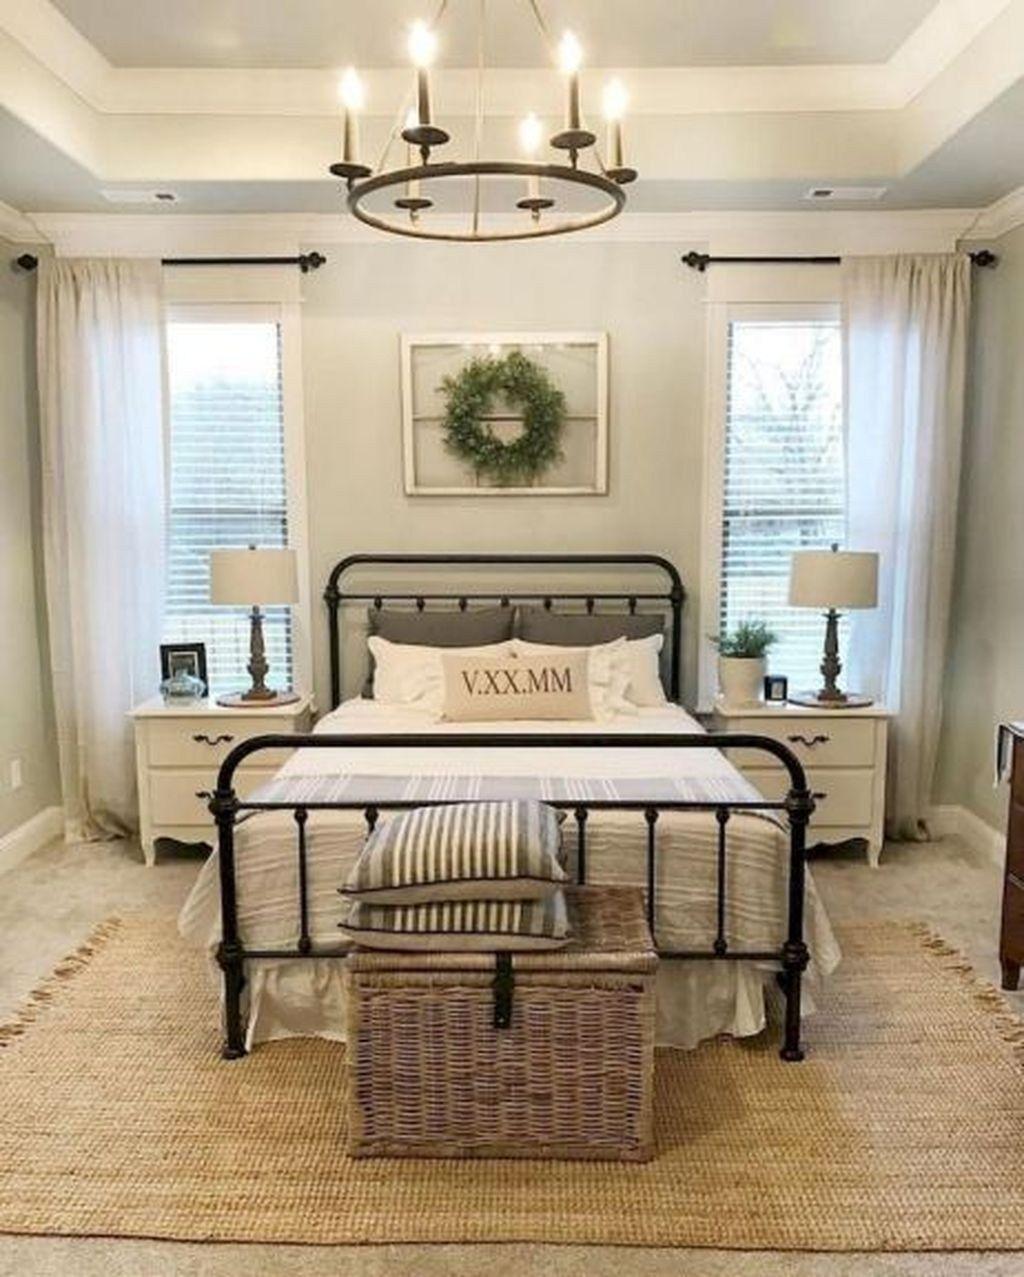 16 Classy Rustic Bedroom Designs: 30+ Elegant Farmhouse Decor Ideas For Bedroom